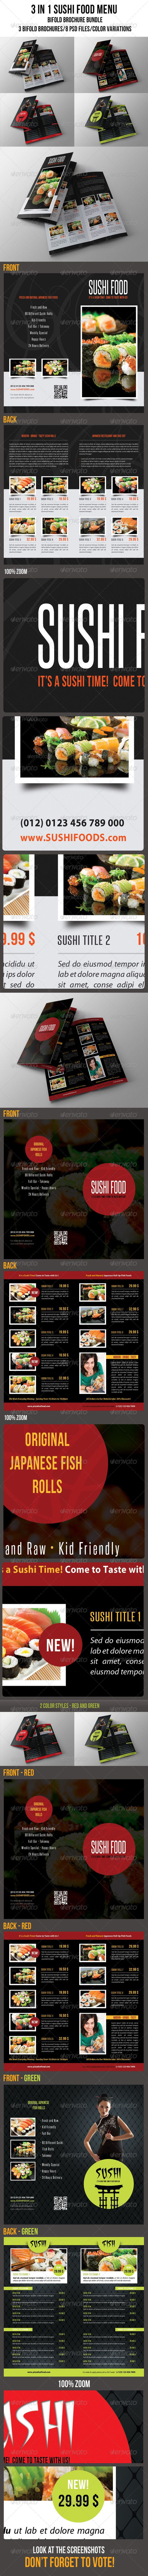 3 in 1 Sushi Food Menu BiFold Brochure Bundle Print Template PSD | Buy and Download: http://graphicriver.net/item/3-in-1-sushi-food-menu-bifold-brochure-bundle-01/8435396?WT.ac=category_thumb&WT.z_author=rapidgraf&ref=ksioks